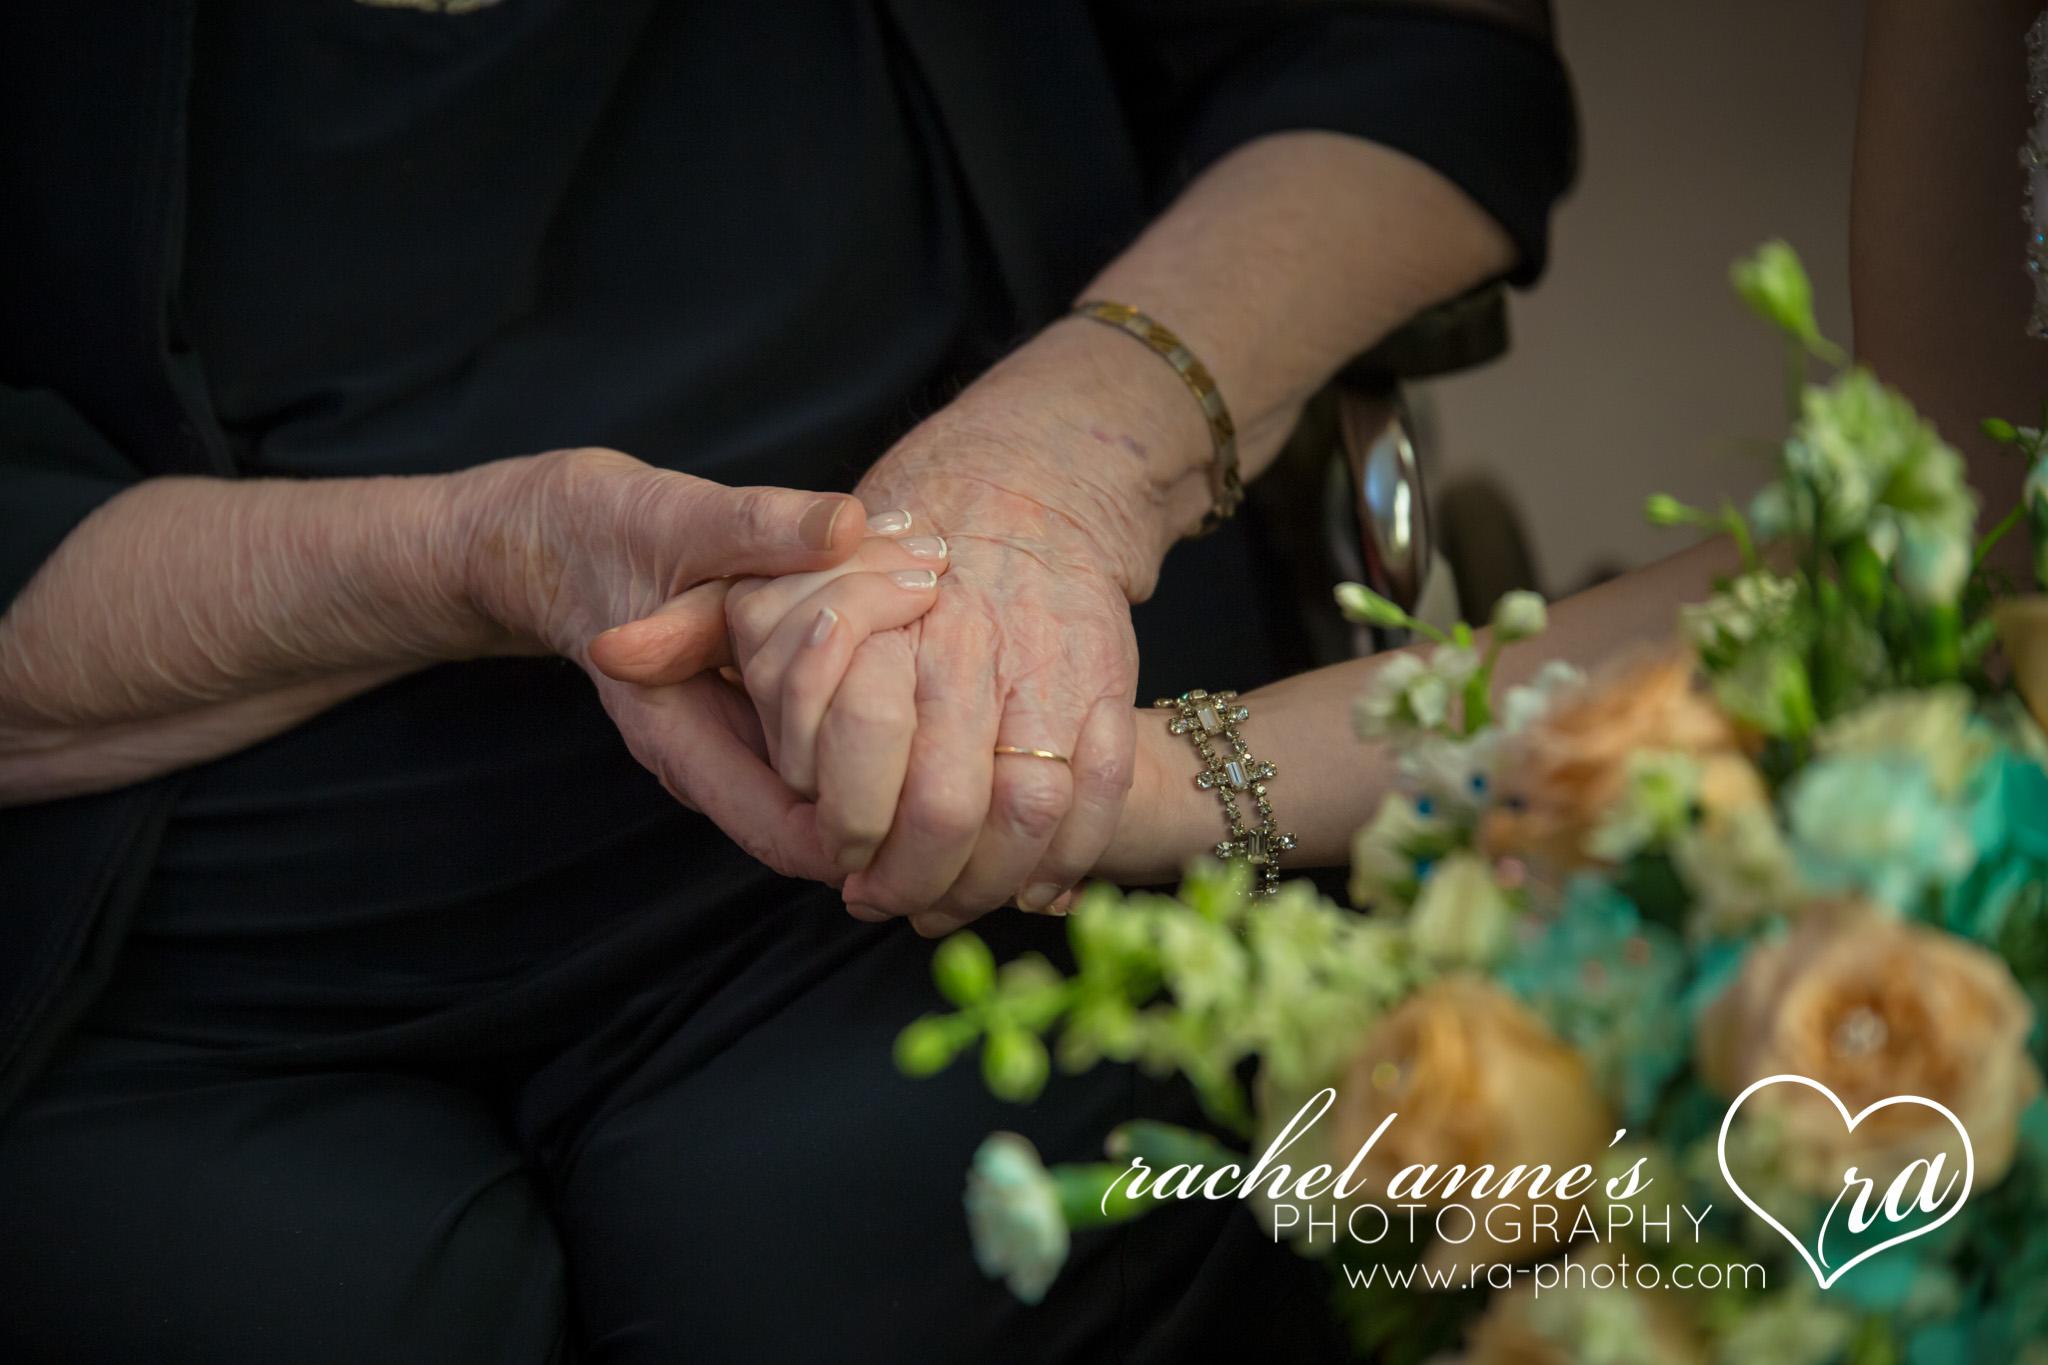 009-JKS-WEDDINGS-THE-FRANKLIN-PA.jpg